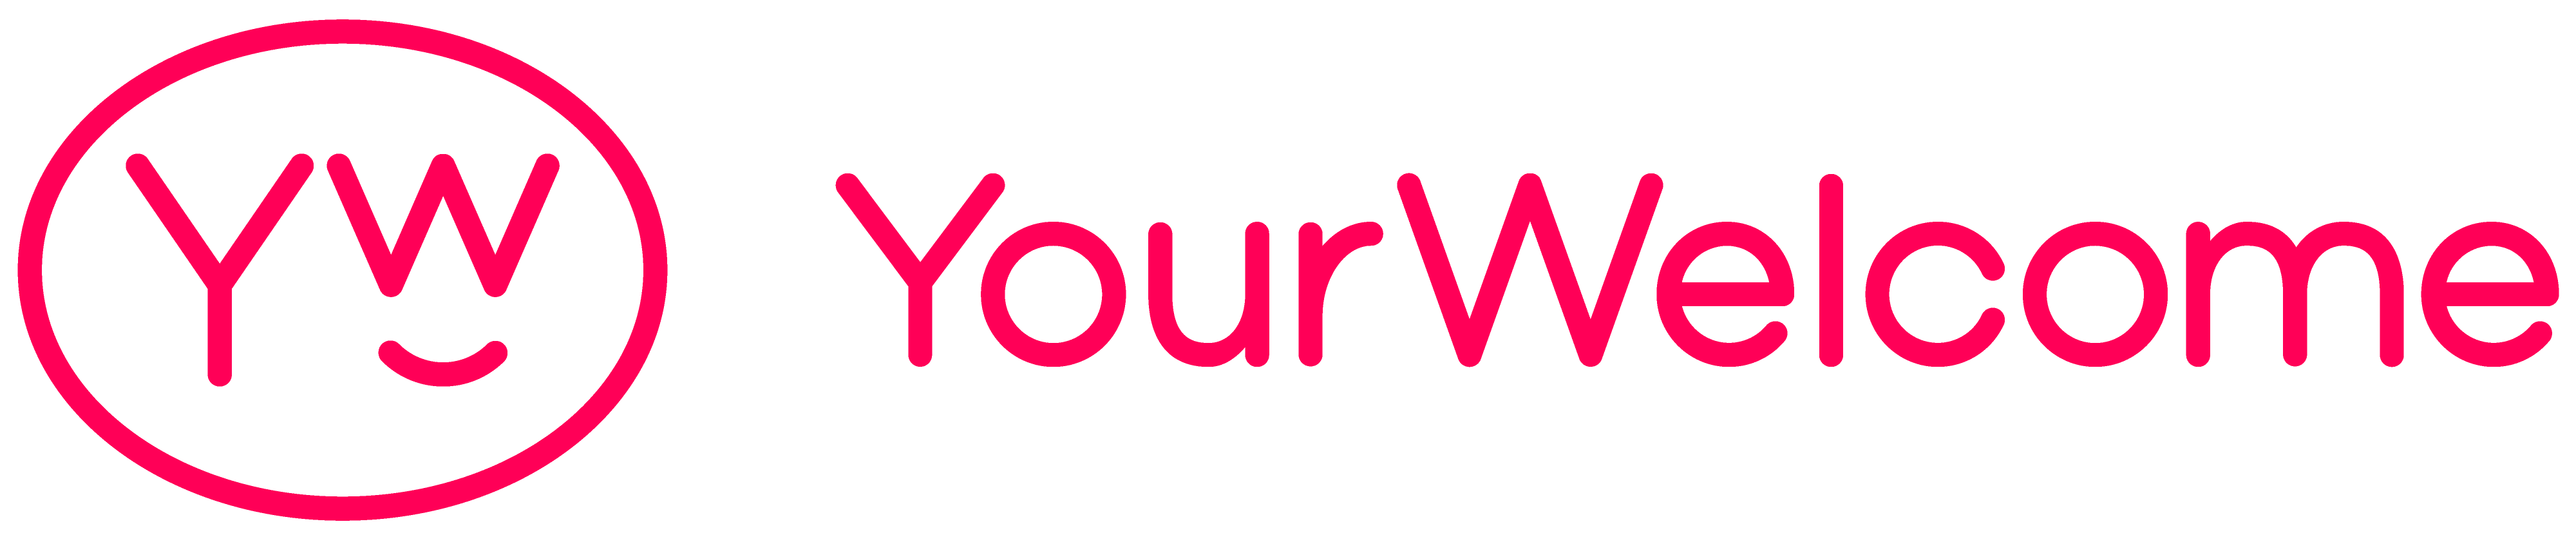 YourWelcome logo